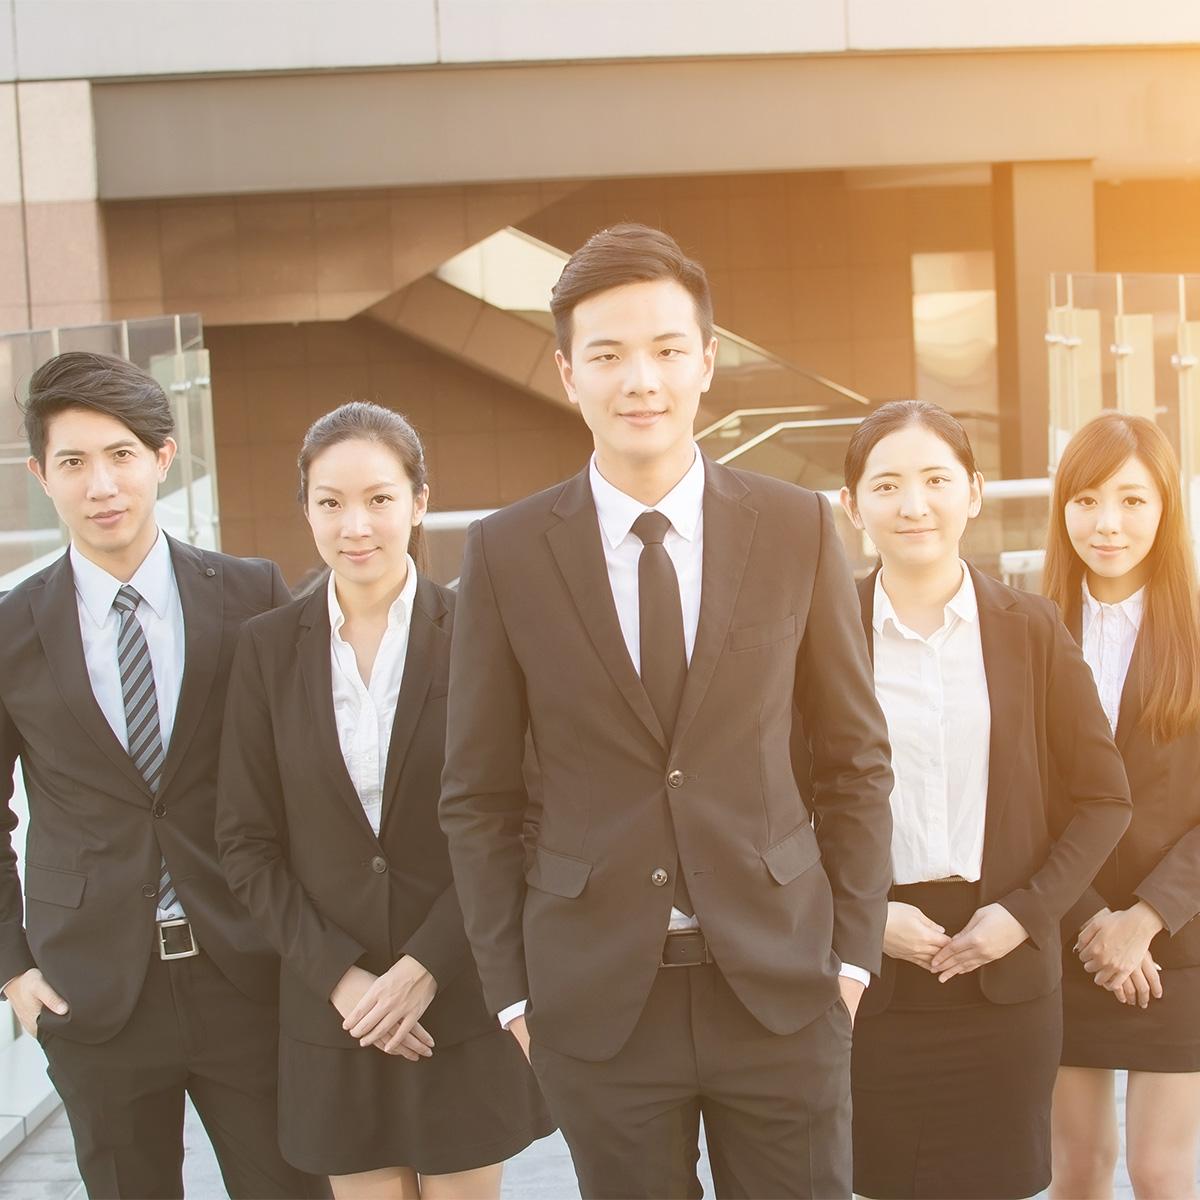 PPCC Core Values - LEADERSHIP